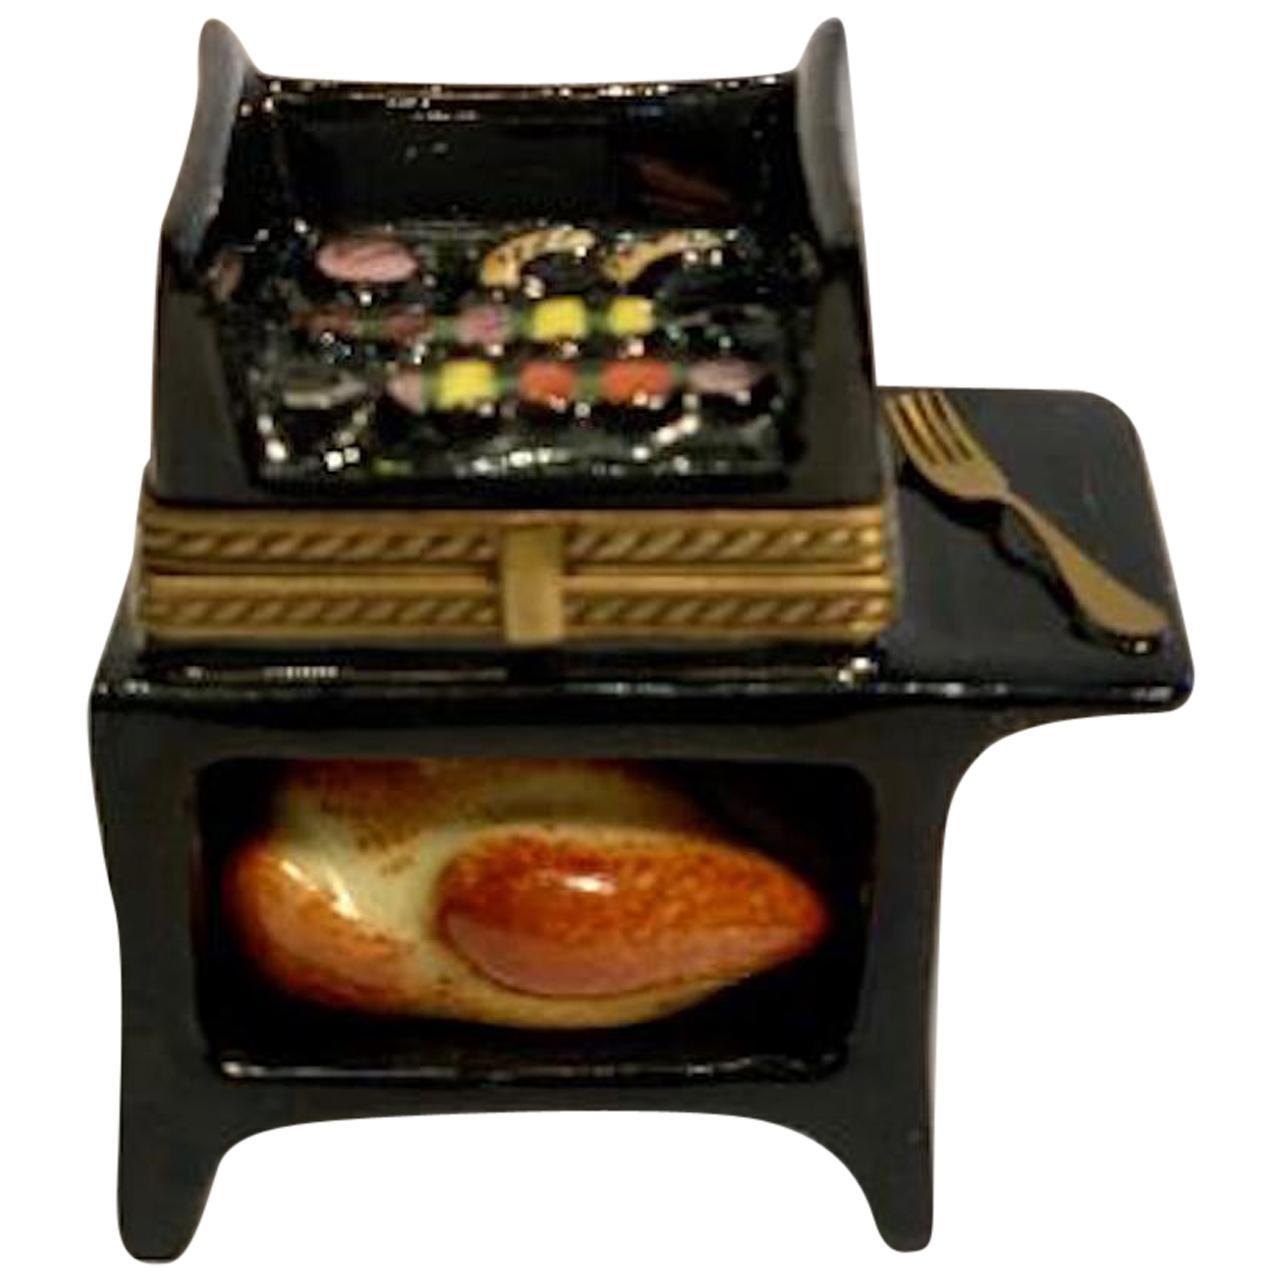 Unique Grill Master Limoges France Hand Painted Barbeque Porcelain Trinket Box